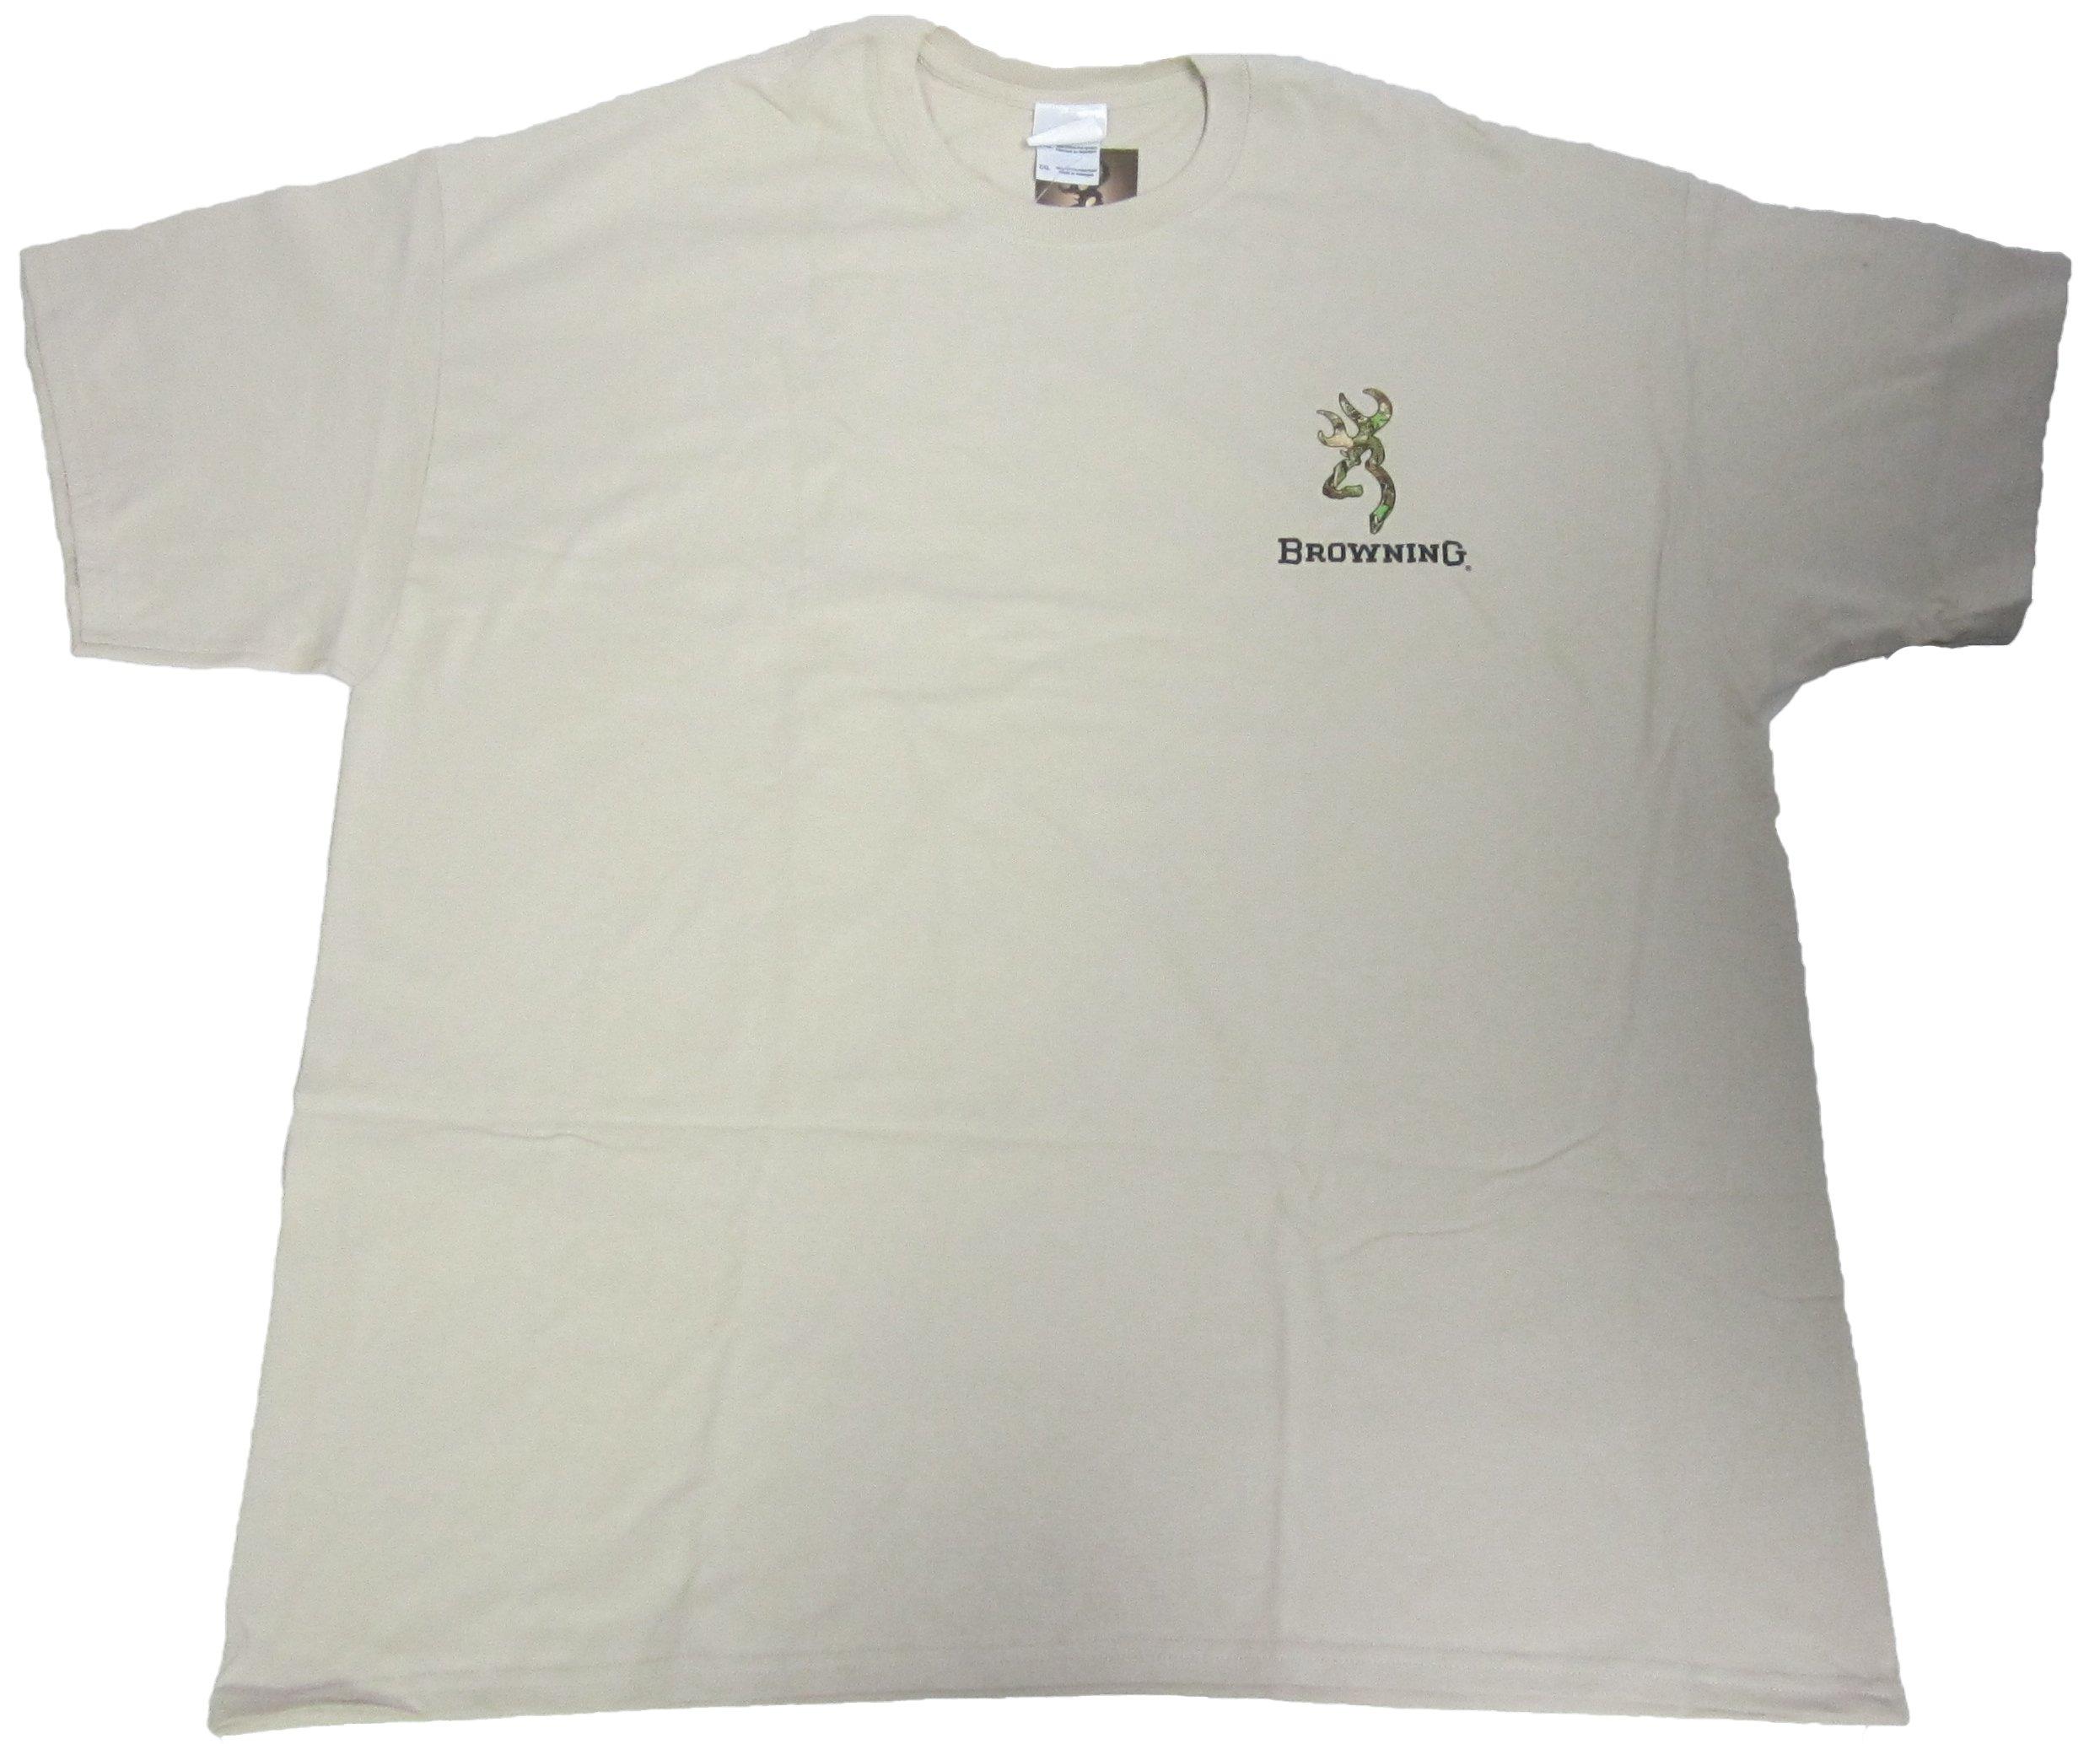 caba1f69ab003 NWT Mens Browning Custom Camo Buckmark Short Sleeve T-Shirt Sand Size 2XL